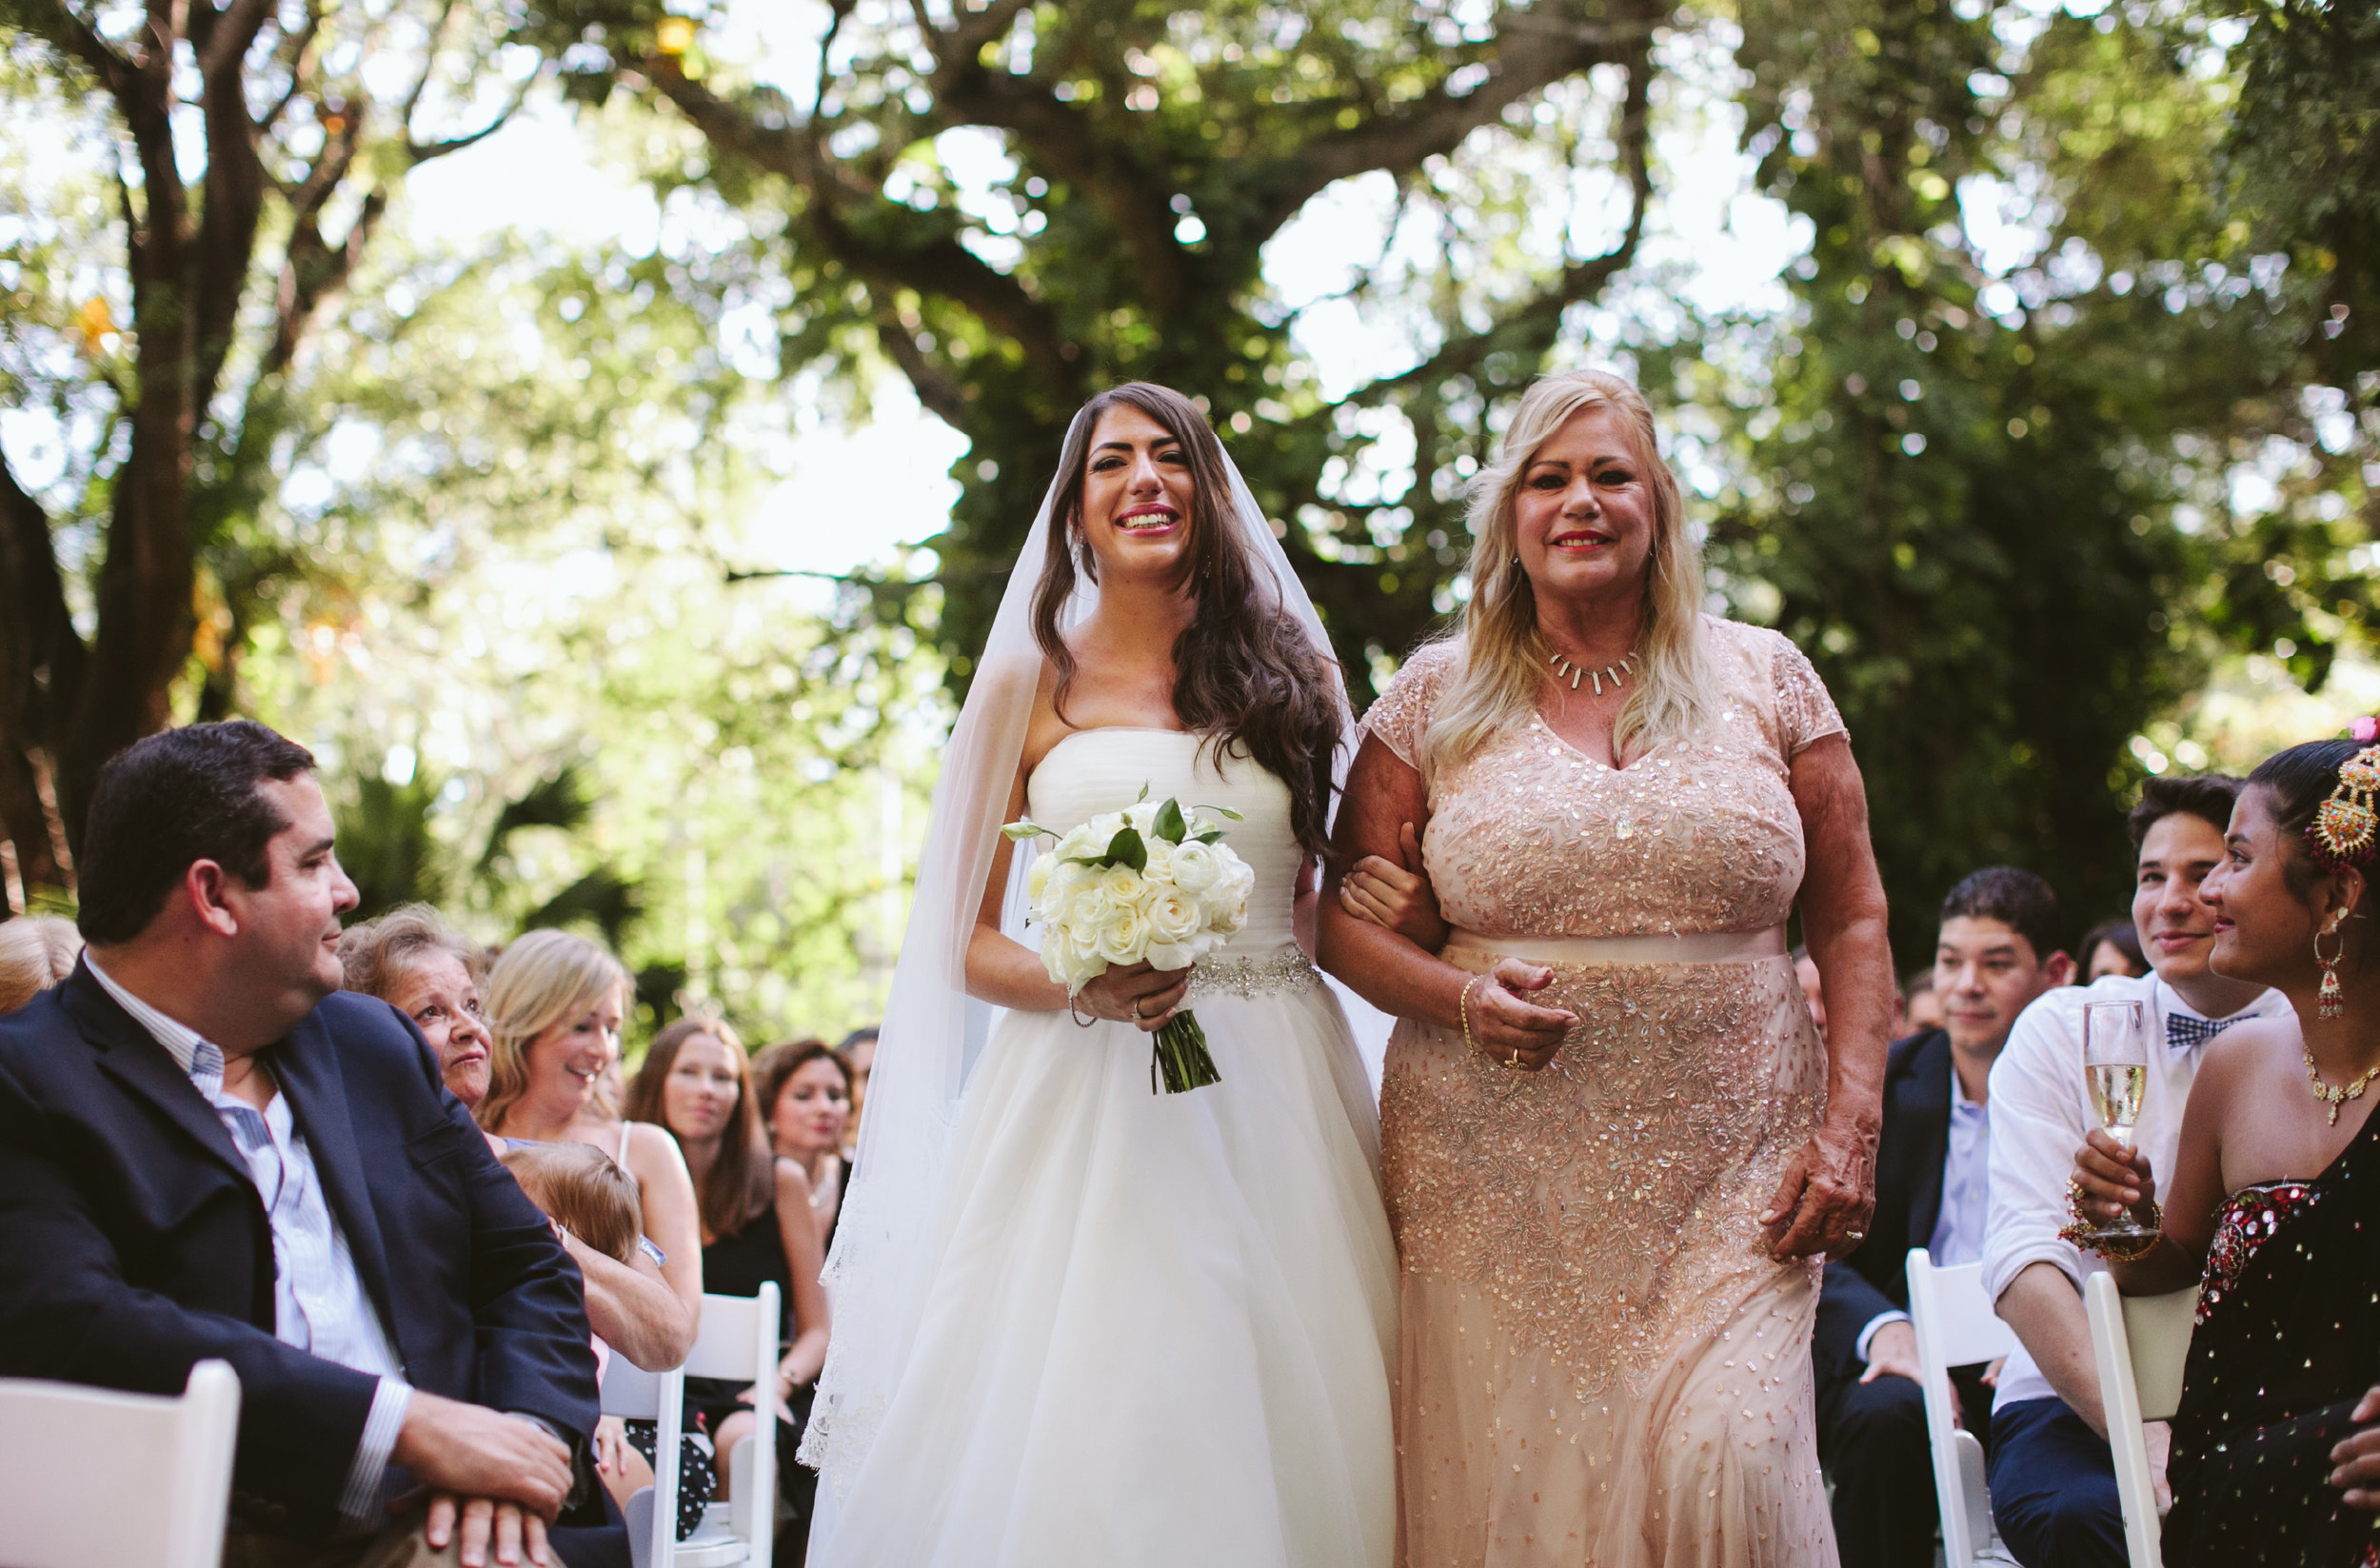 Meli + Mike Coconut Grove Wedding at Villa Woodbine47.jpg